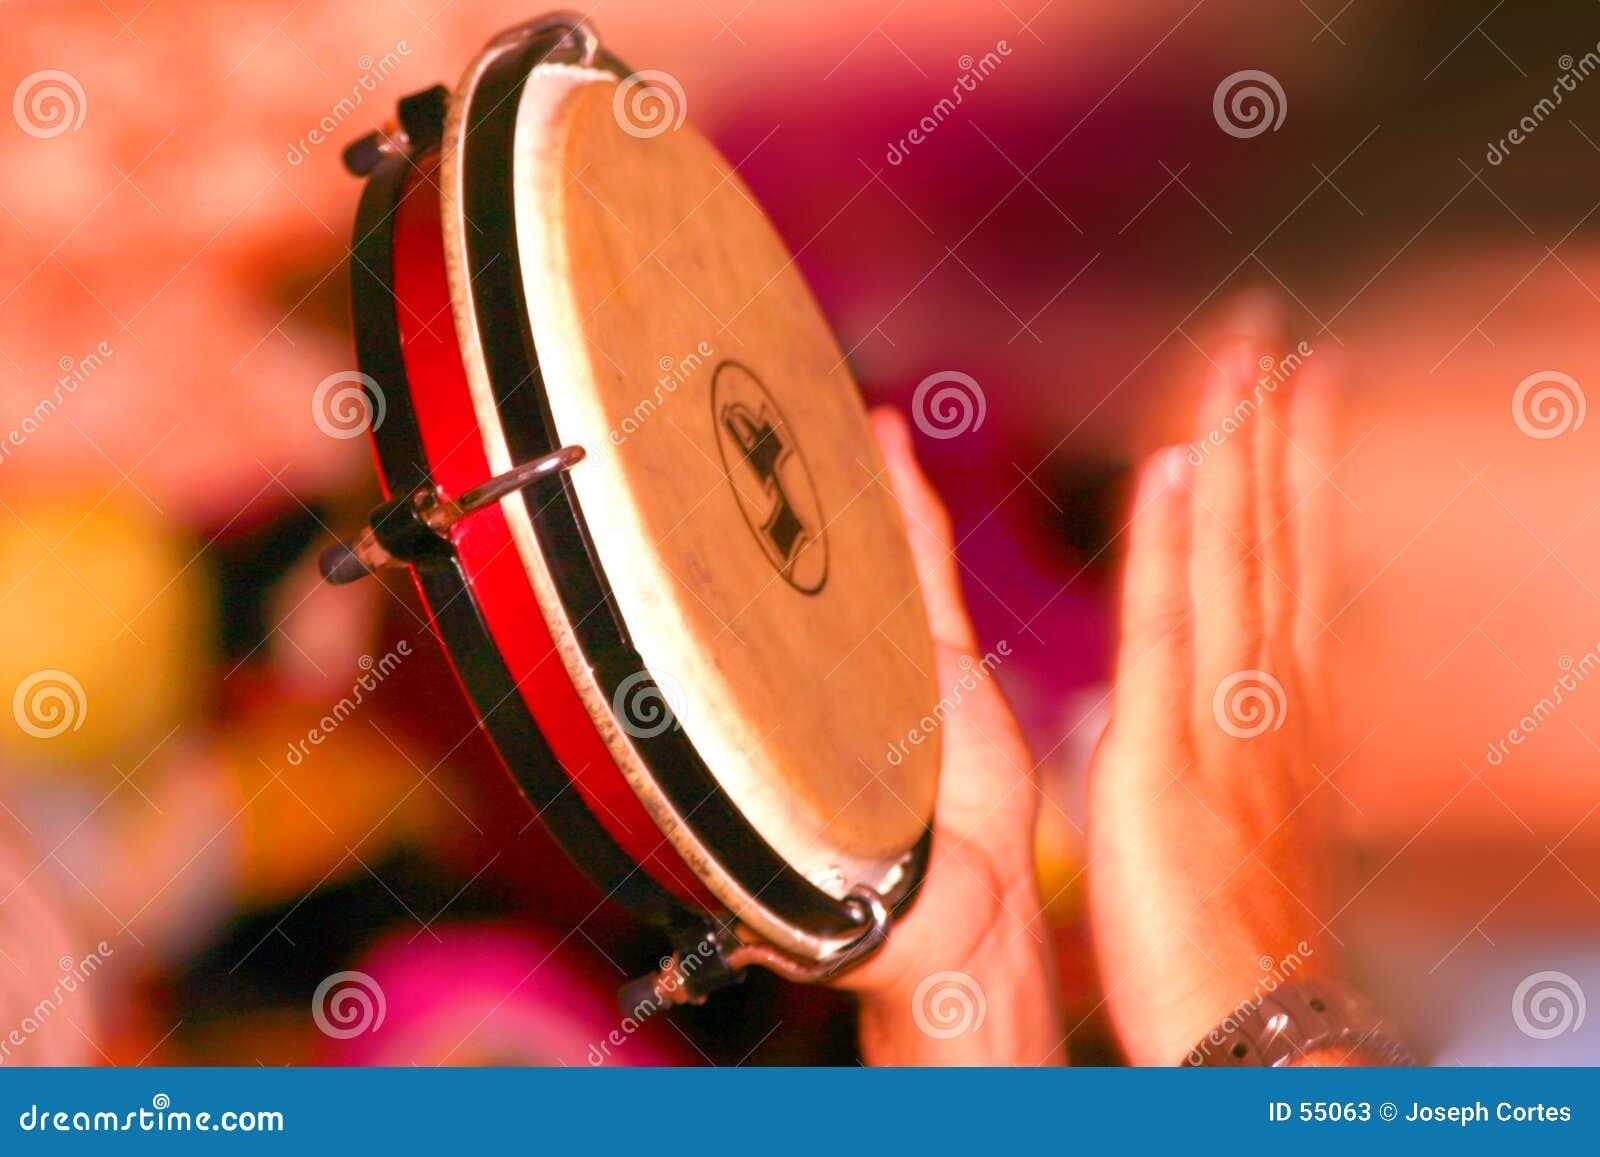 Christmas instrument